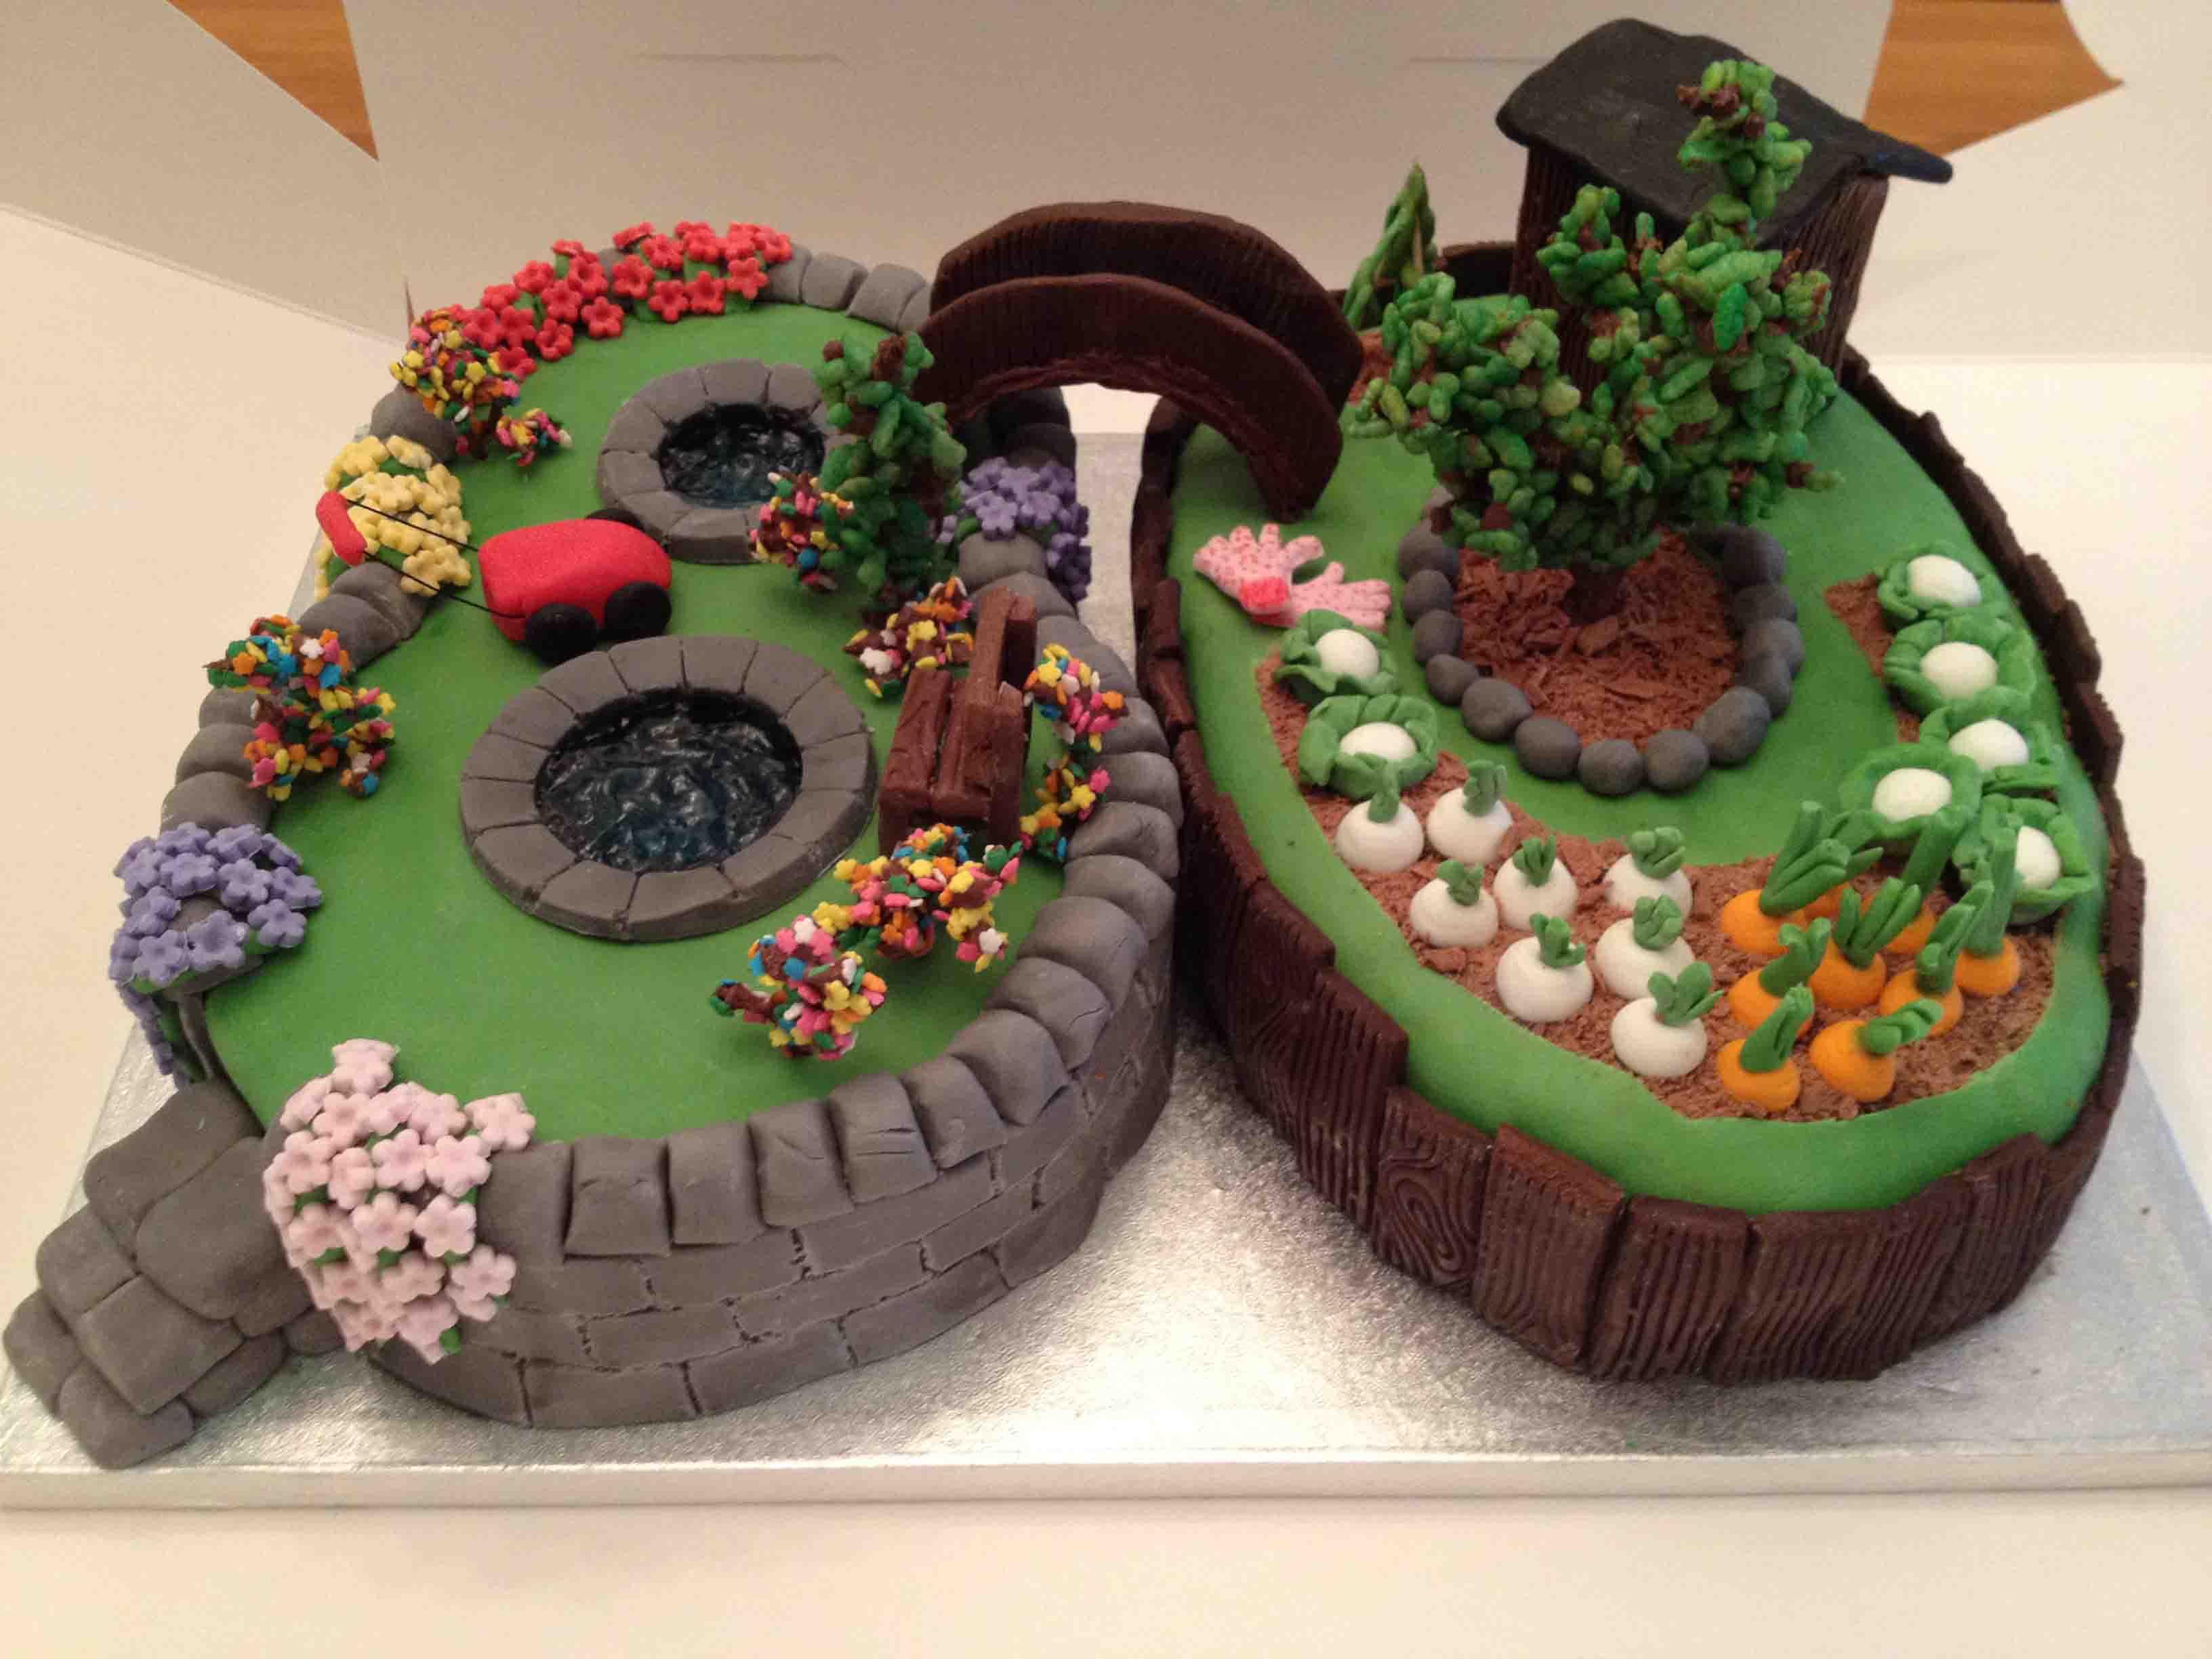 Garden Cake - Amazing Cake Ideas